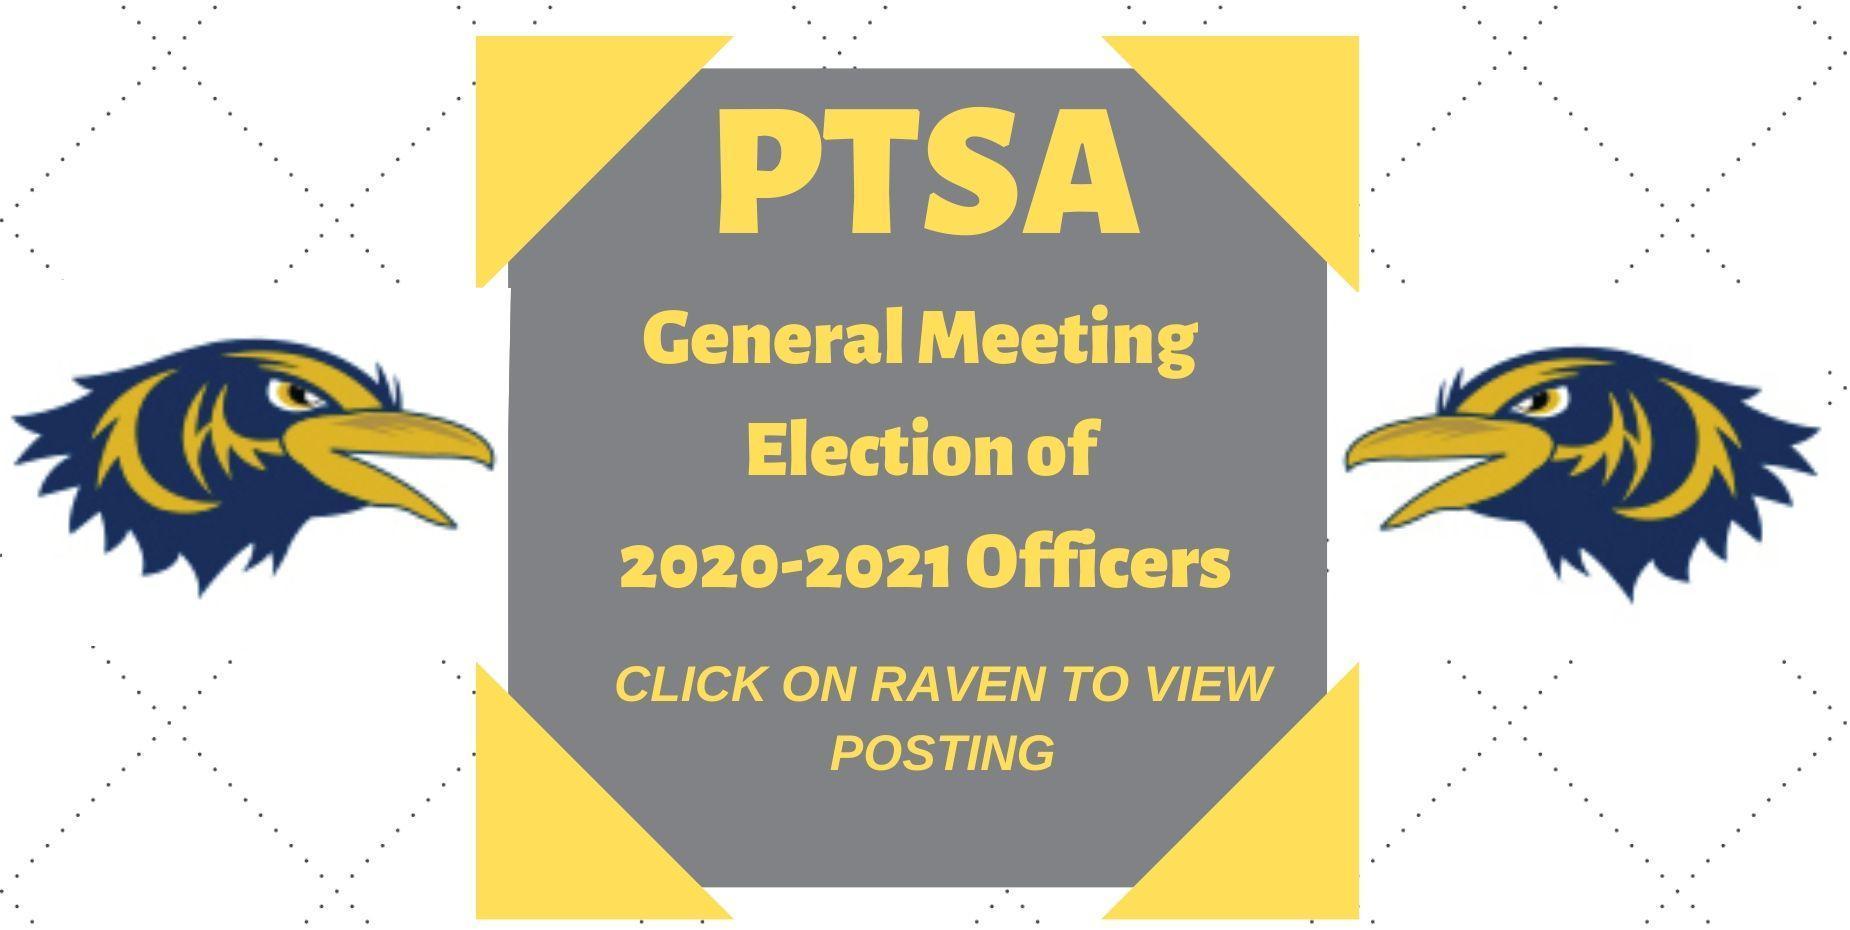 PTSA General Meeting Elections 2020-2021